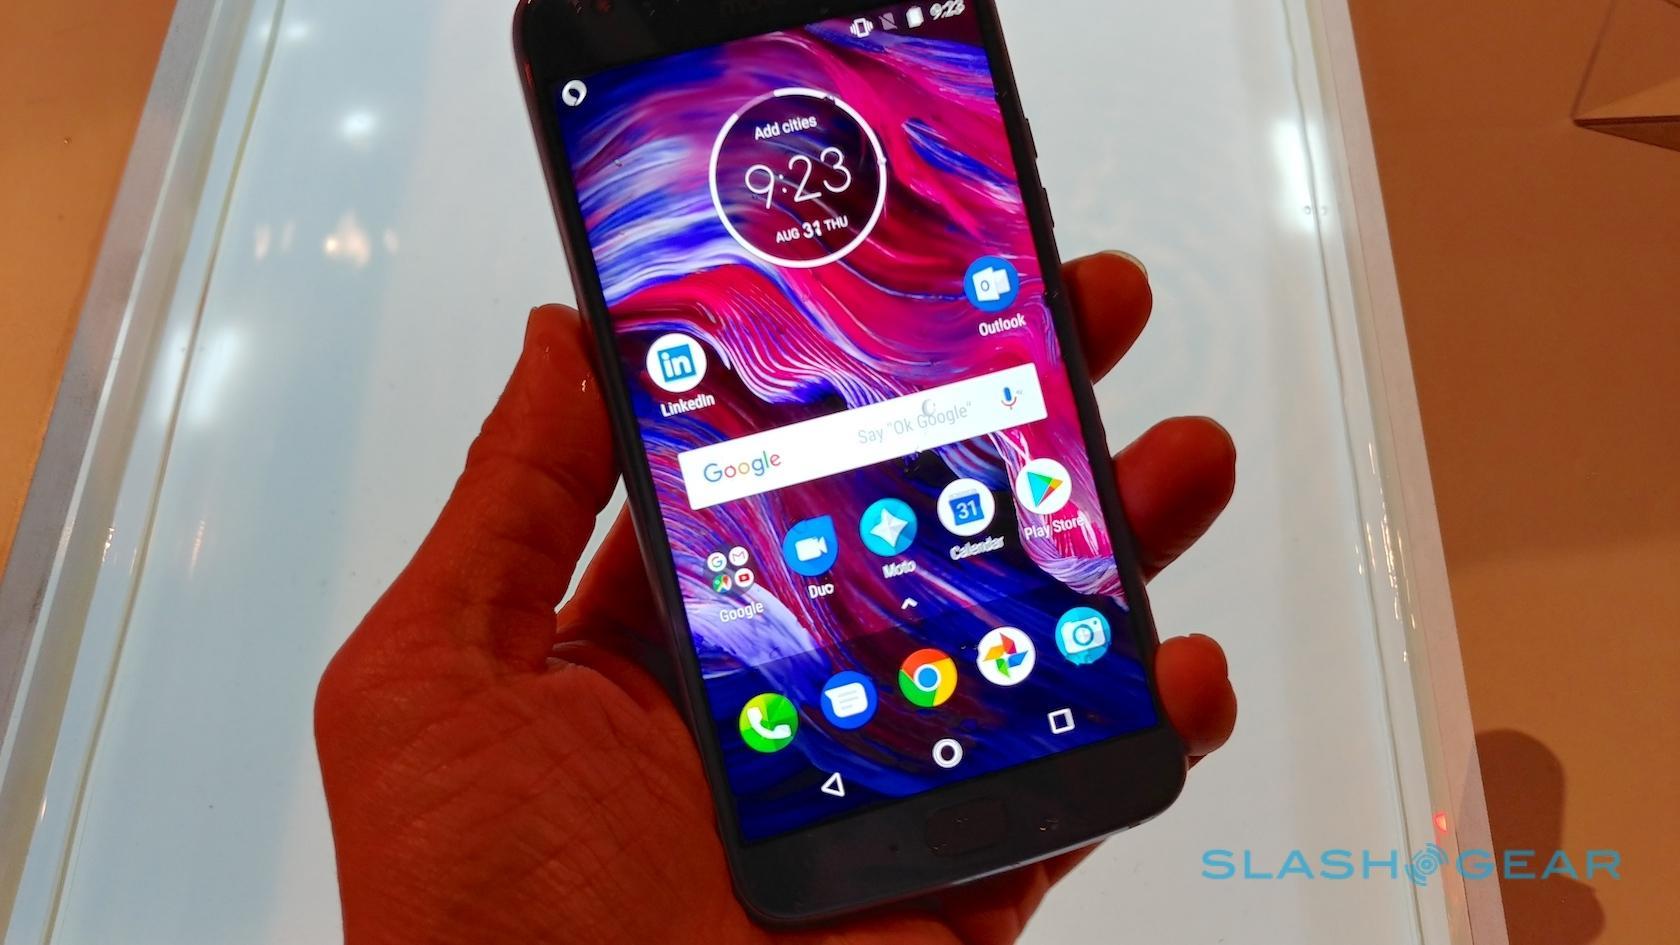 The Moto X4 Streams To 4 Bluetooth Devices Here S How Slashgear